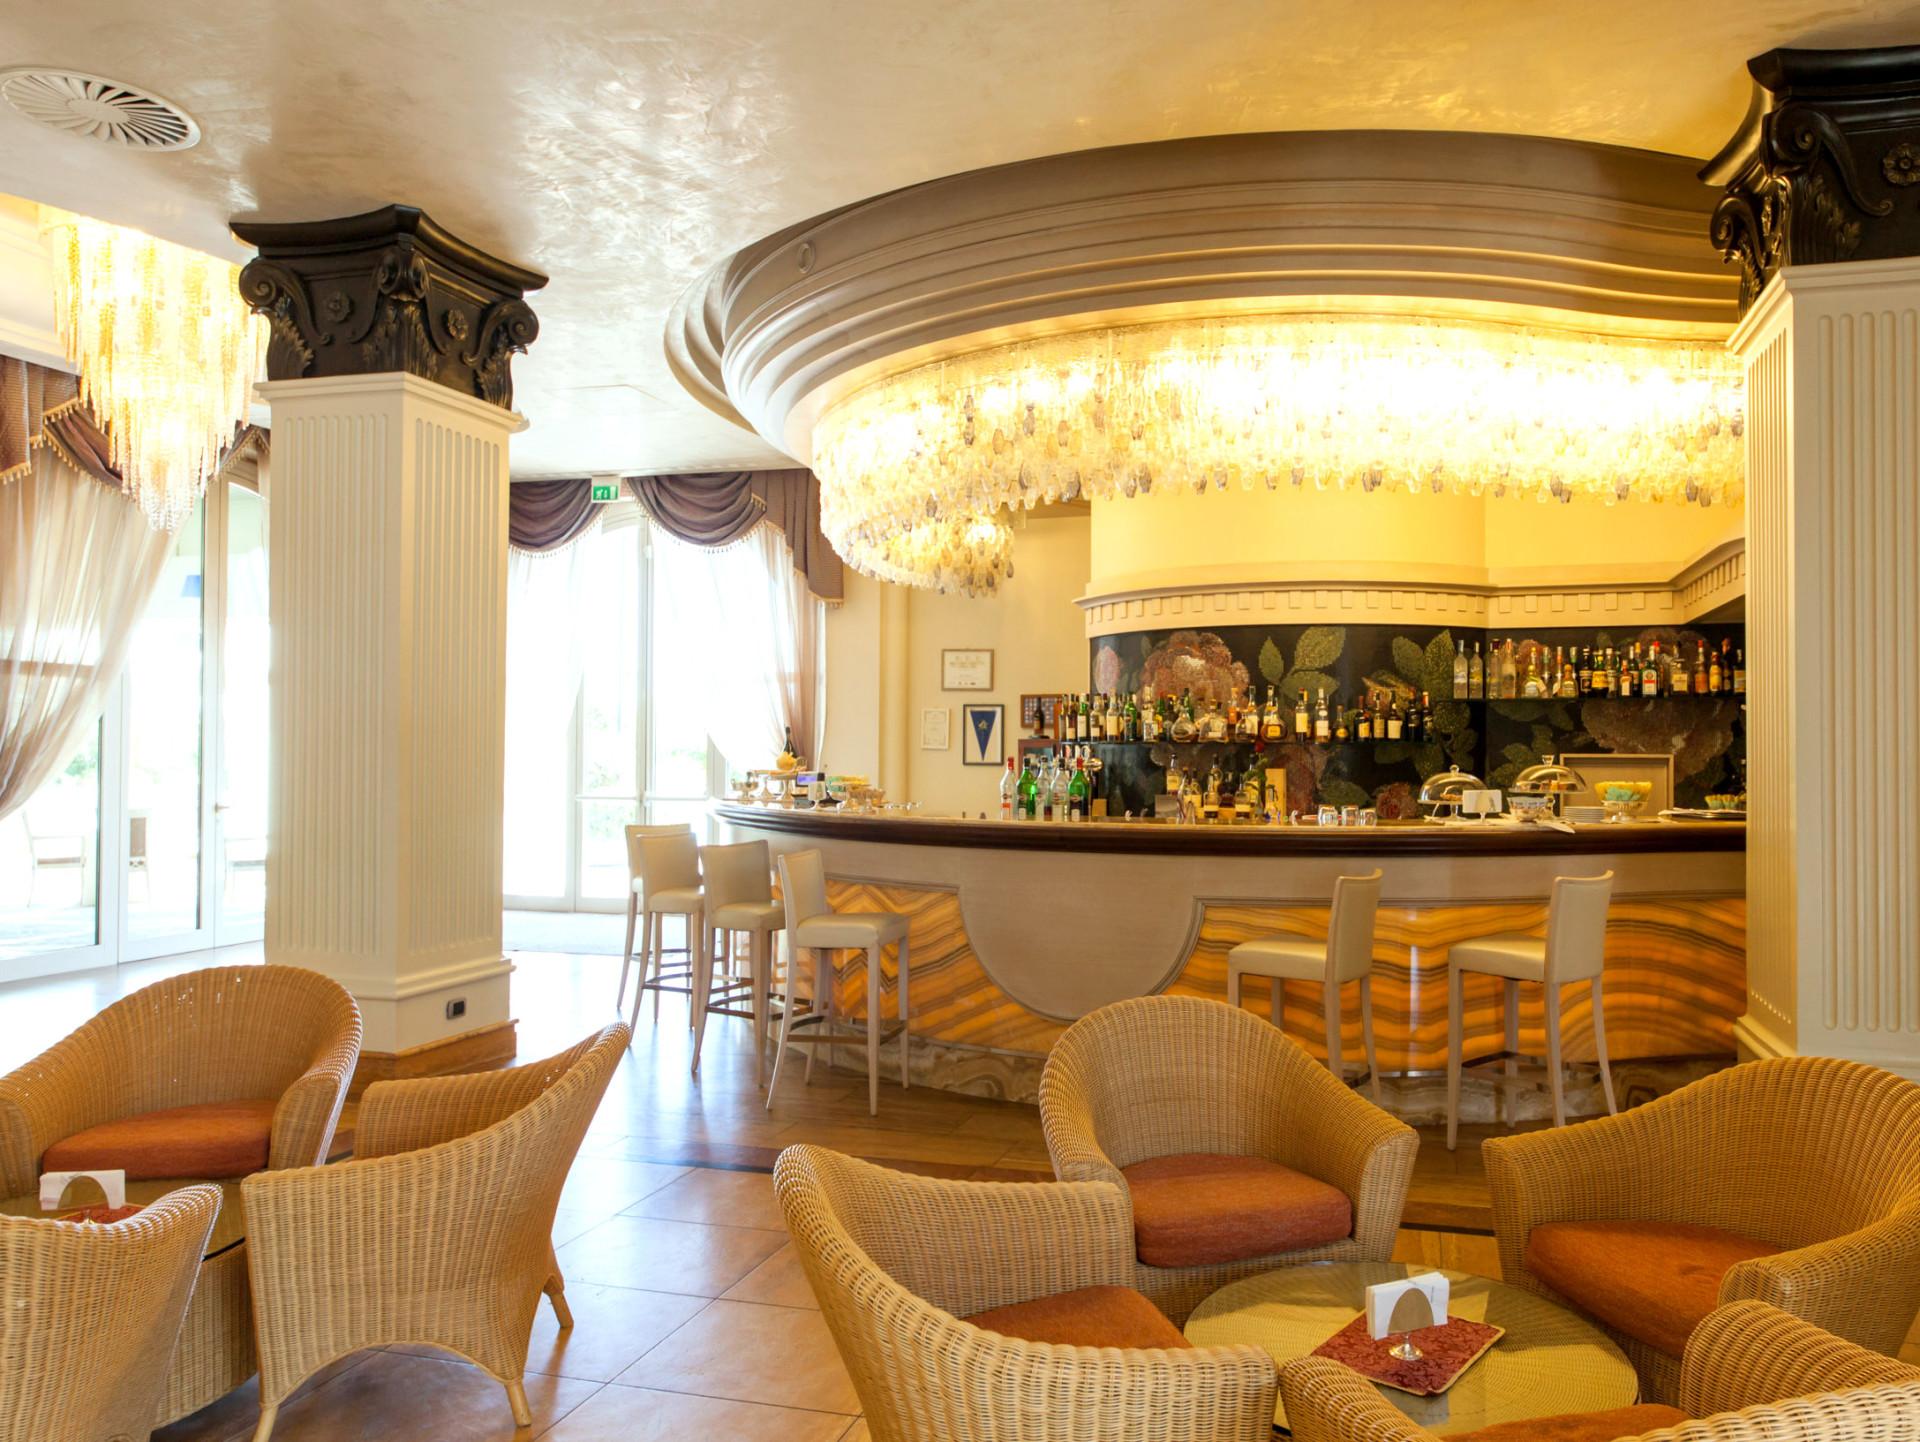 Hotel Palace***** - Milano Marittima